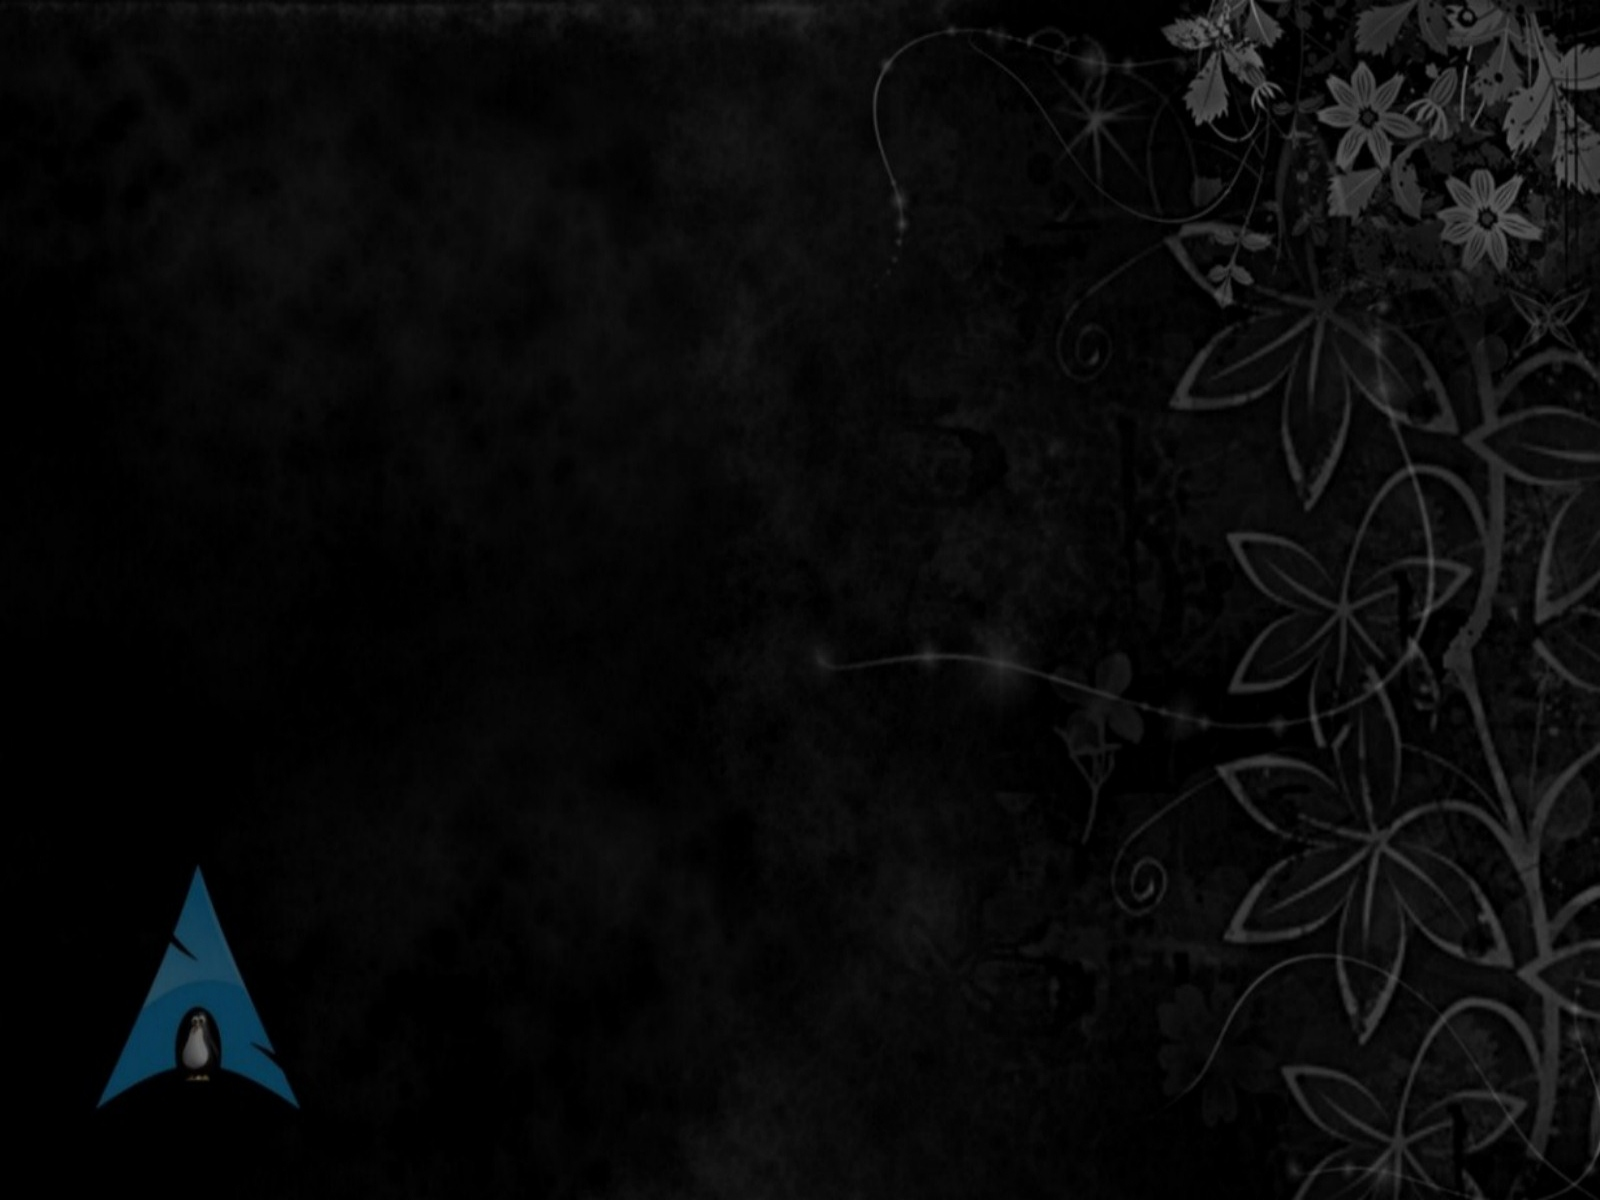 Dark Arch Linux Wallpaper Black Arch Linux Widescreen Background 1600x1200